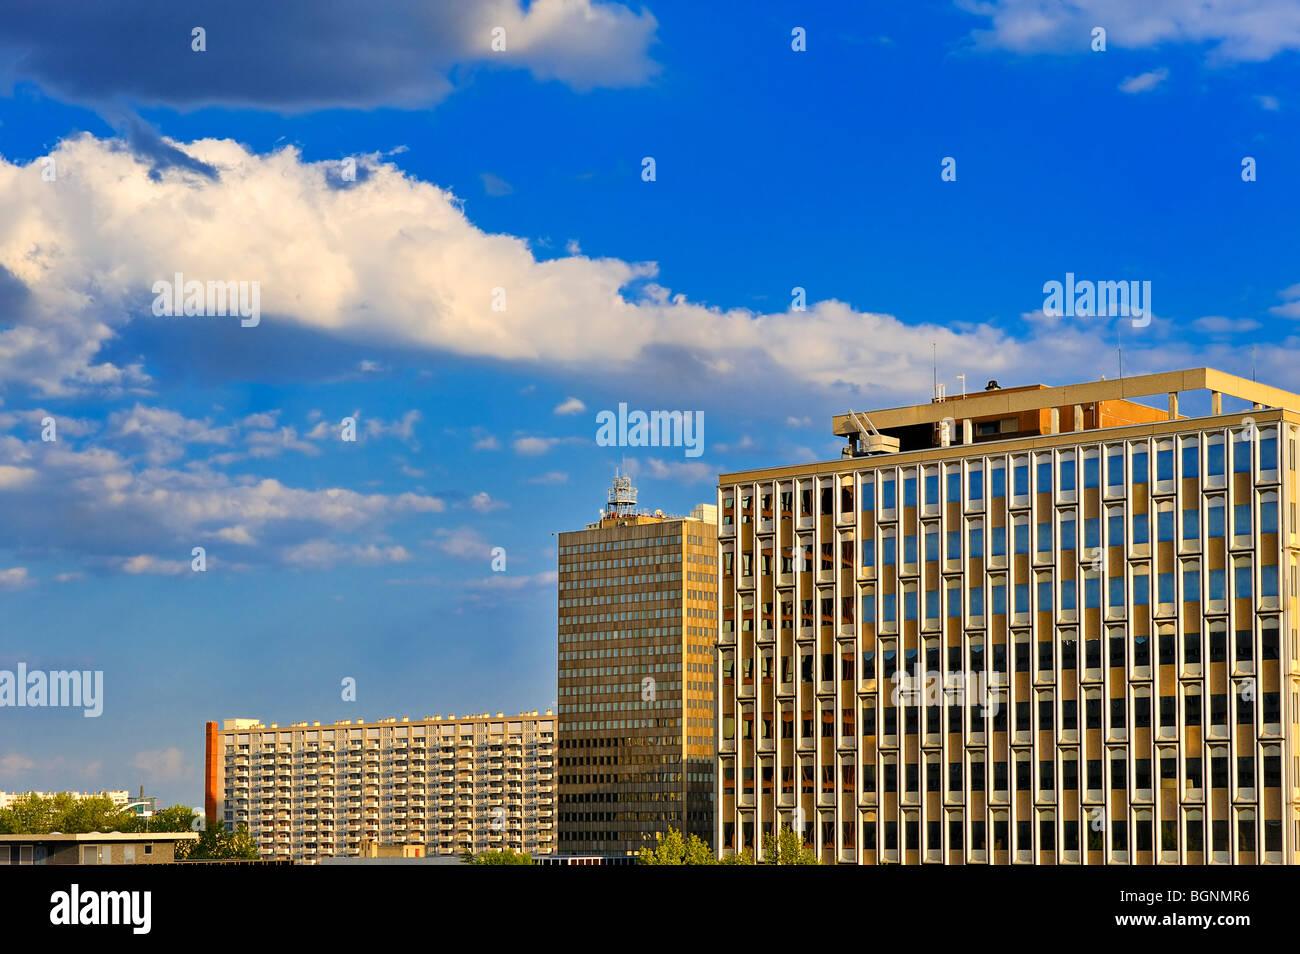 Buildings, Lyon, France. - Stock Image